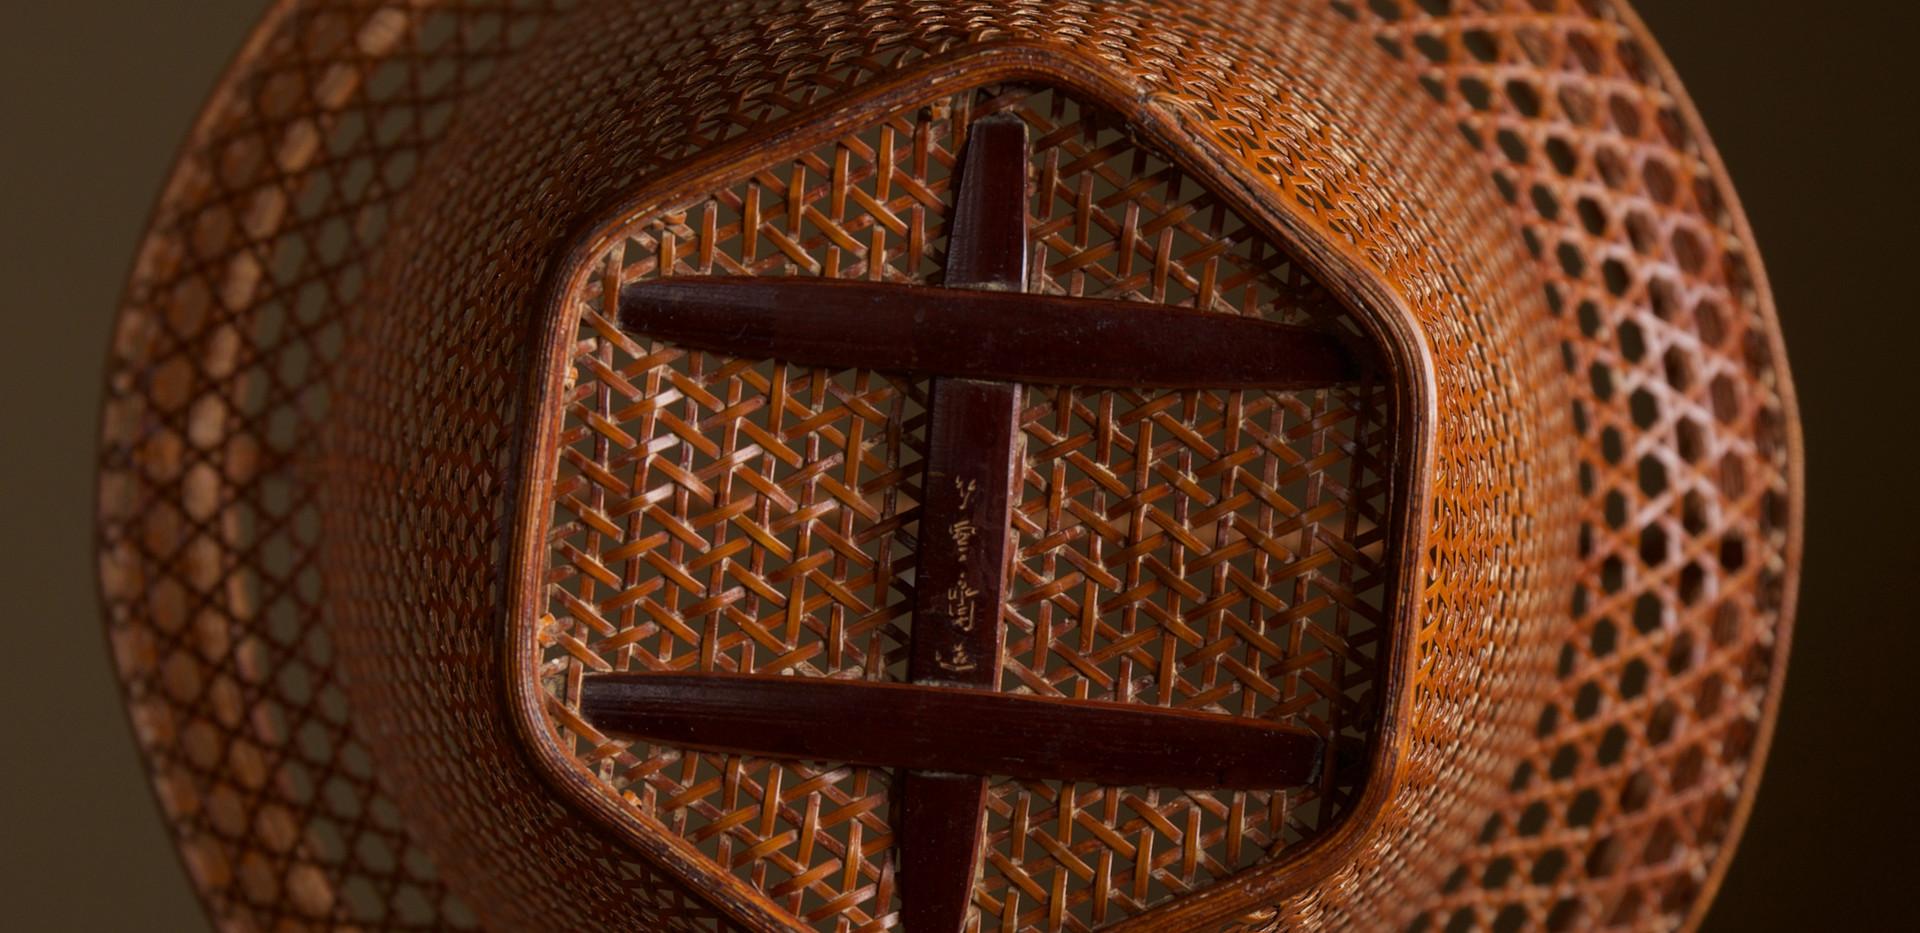 Tanabe Chikuunsai II Clown hat shaped bamboo basket 06.jpg